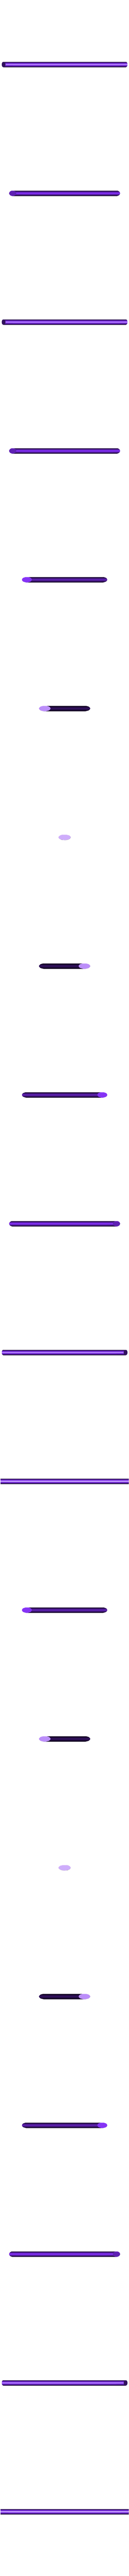 Howard Mike Hor Landing Gear Bar.stl Download STL file Howard Mike Golden Age Air Racer • 3D print template, guaro3d